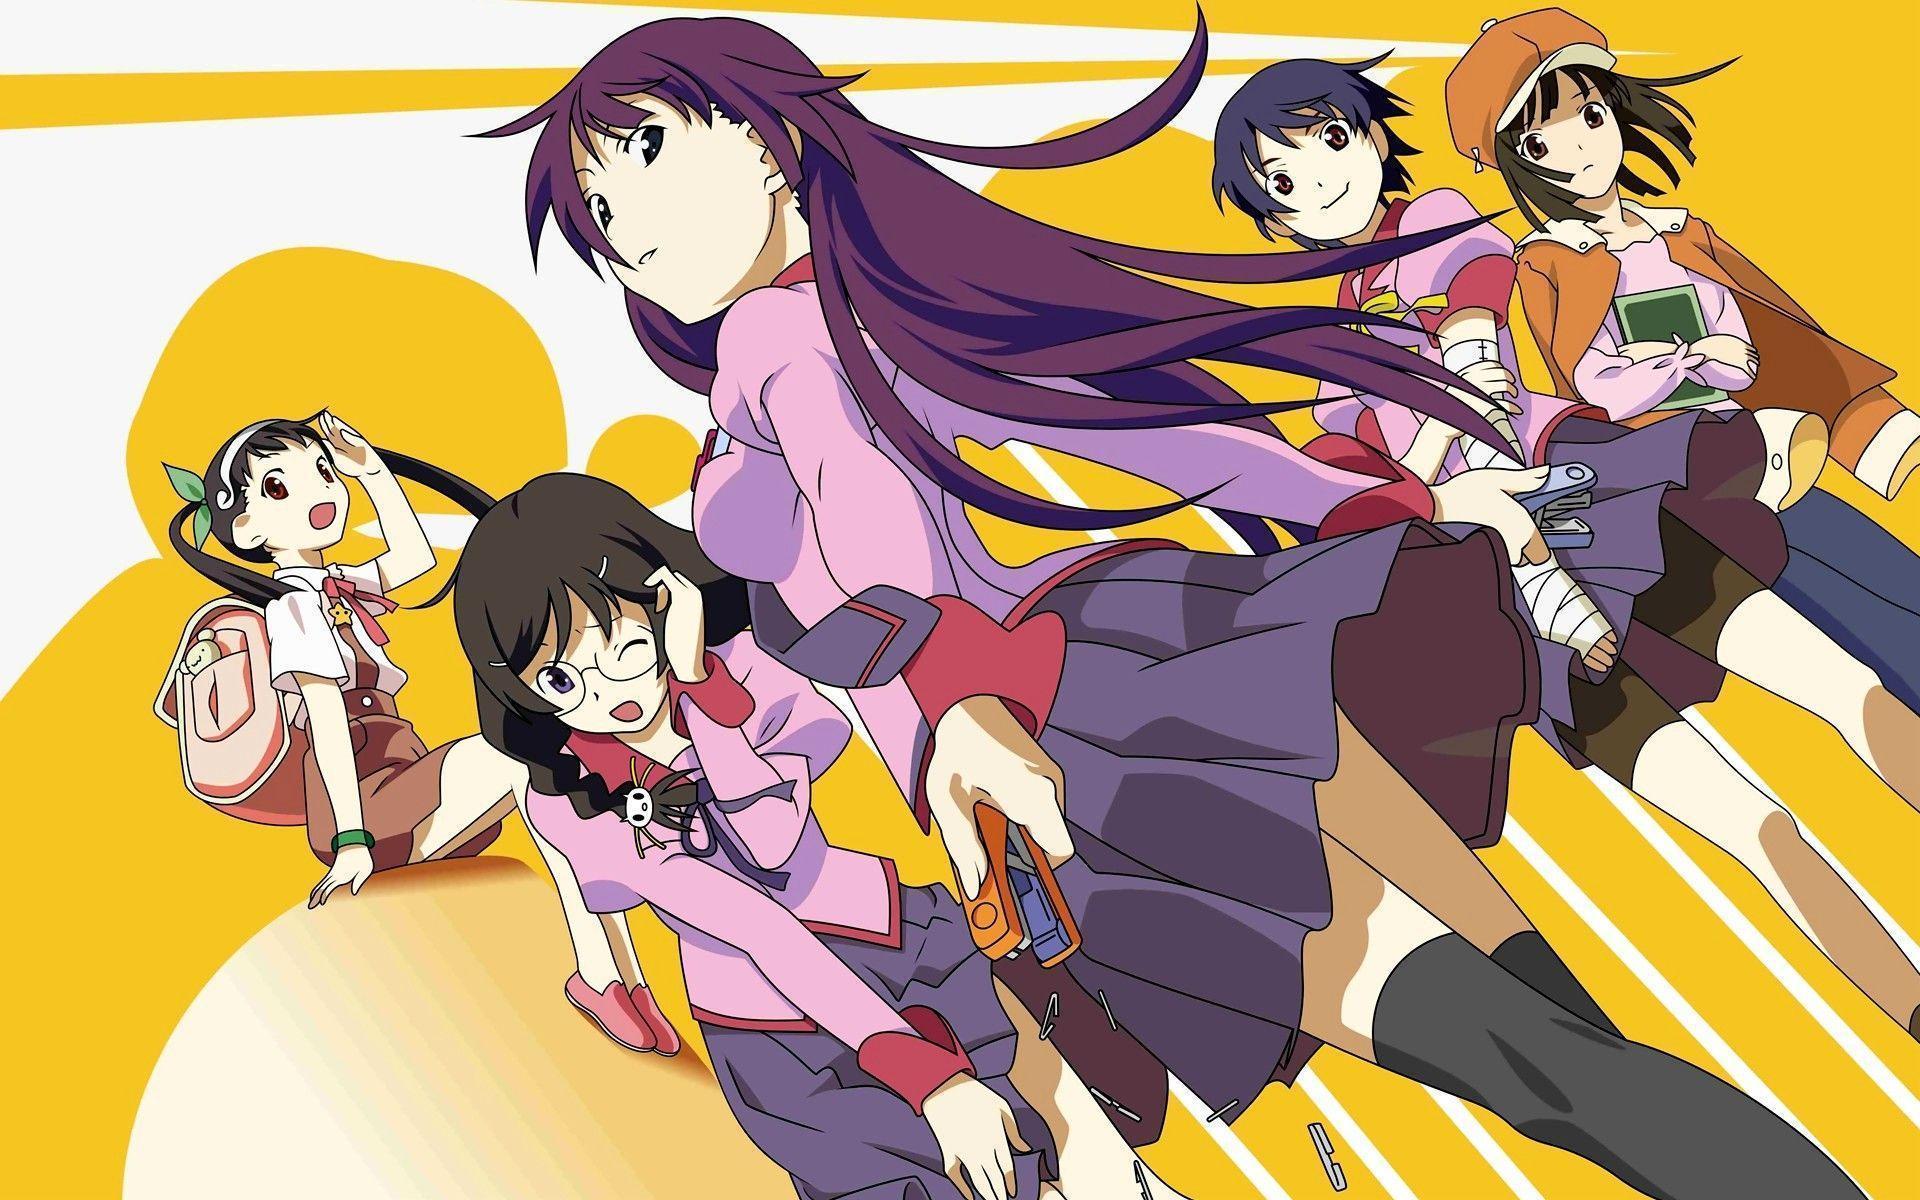 Bakemonogatari Hd Wallpapers And Backgrounds Tsubasa Hanekawa Nadeko Sengoku 1489914 Hd Wallpaper Backgrounds Download